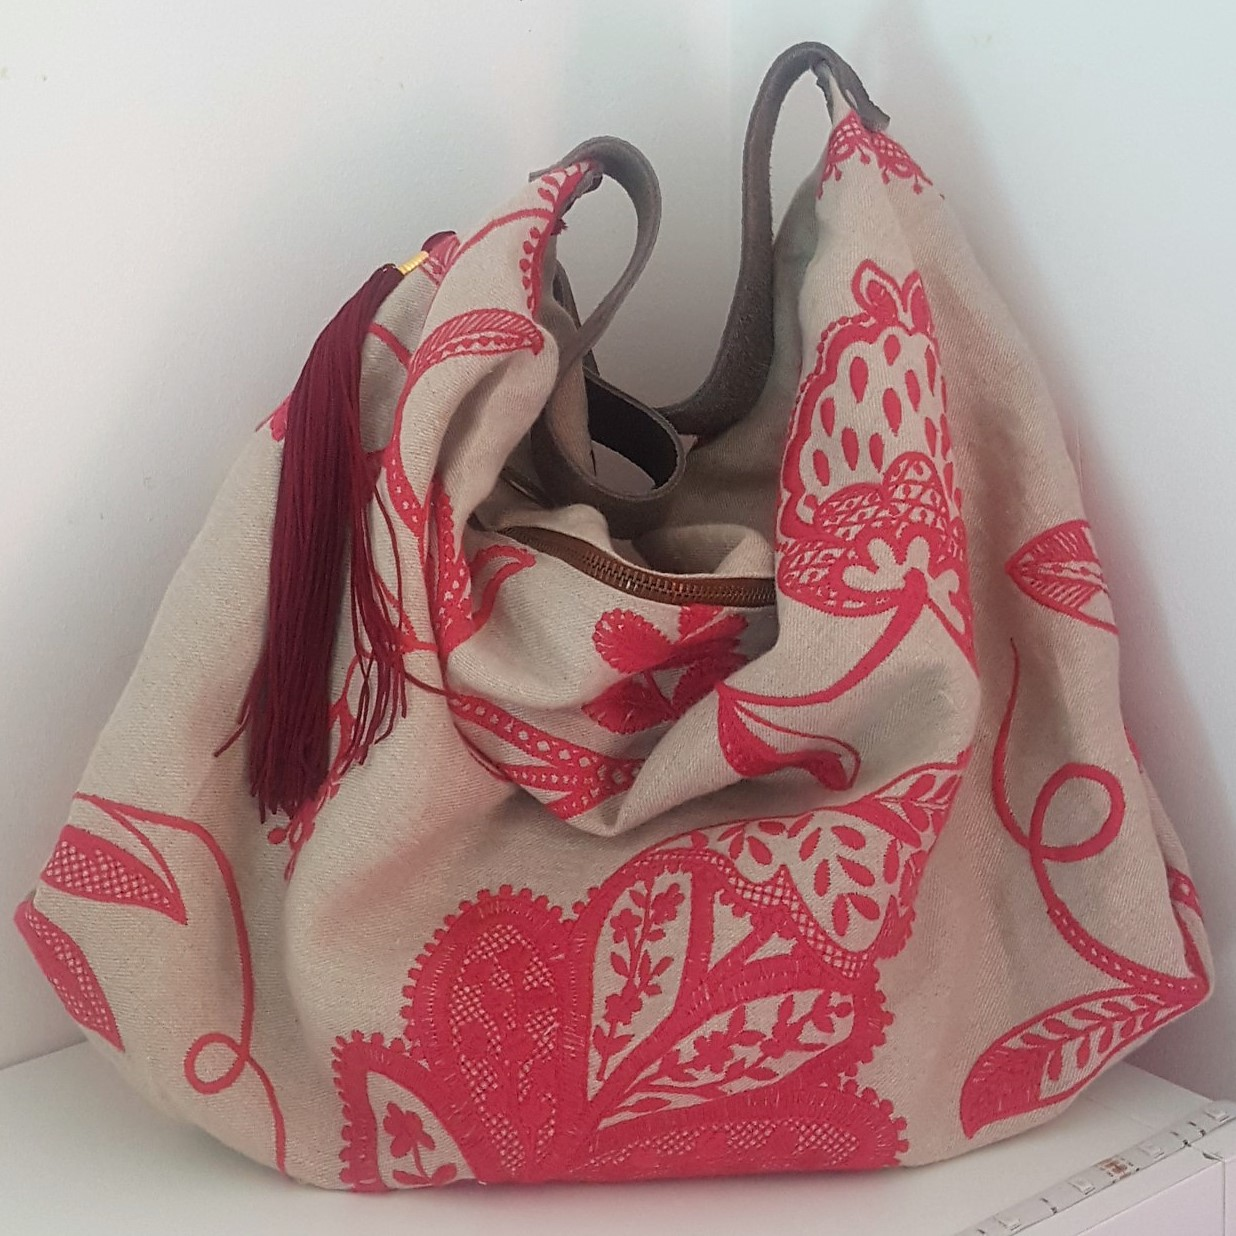 sac lin viscose brodé shopping